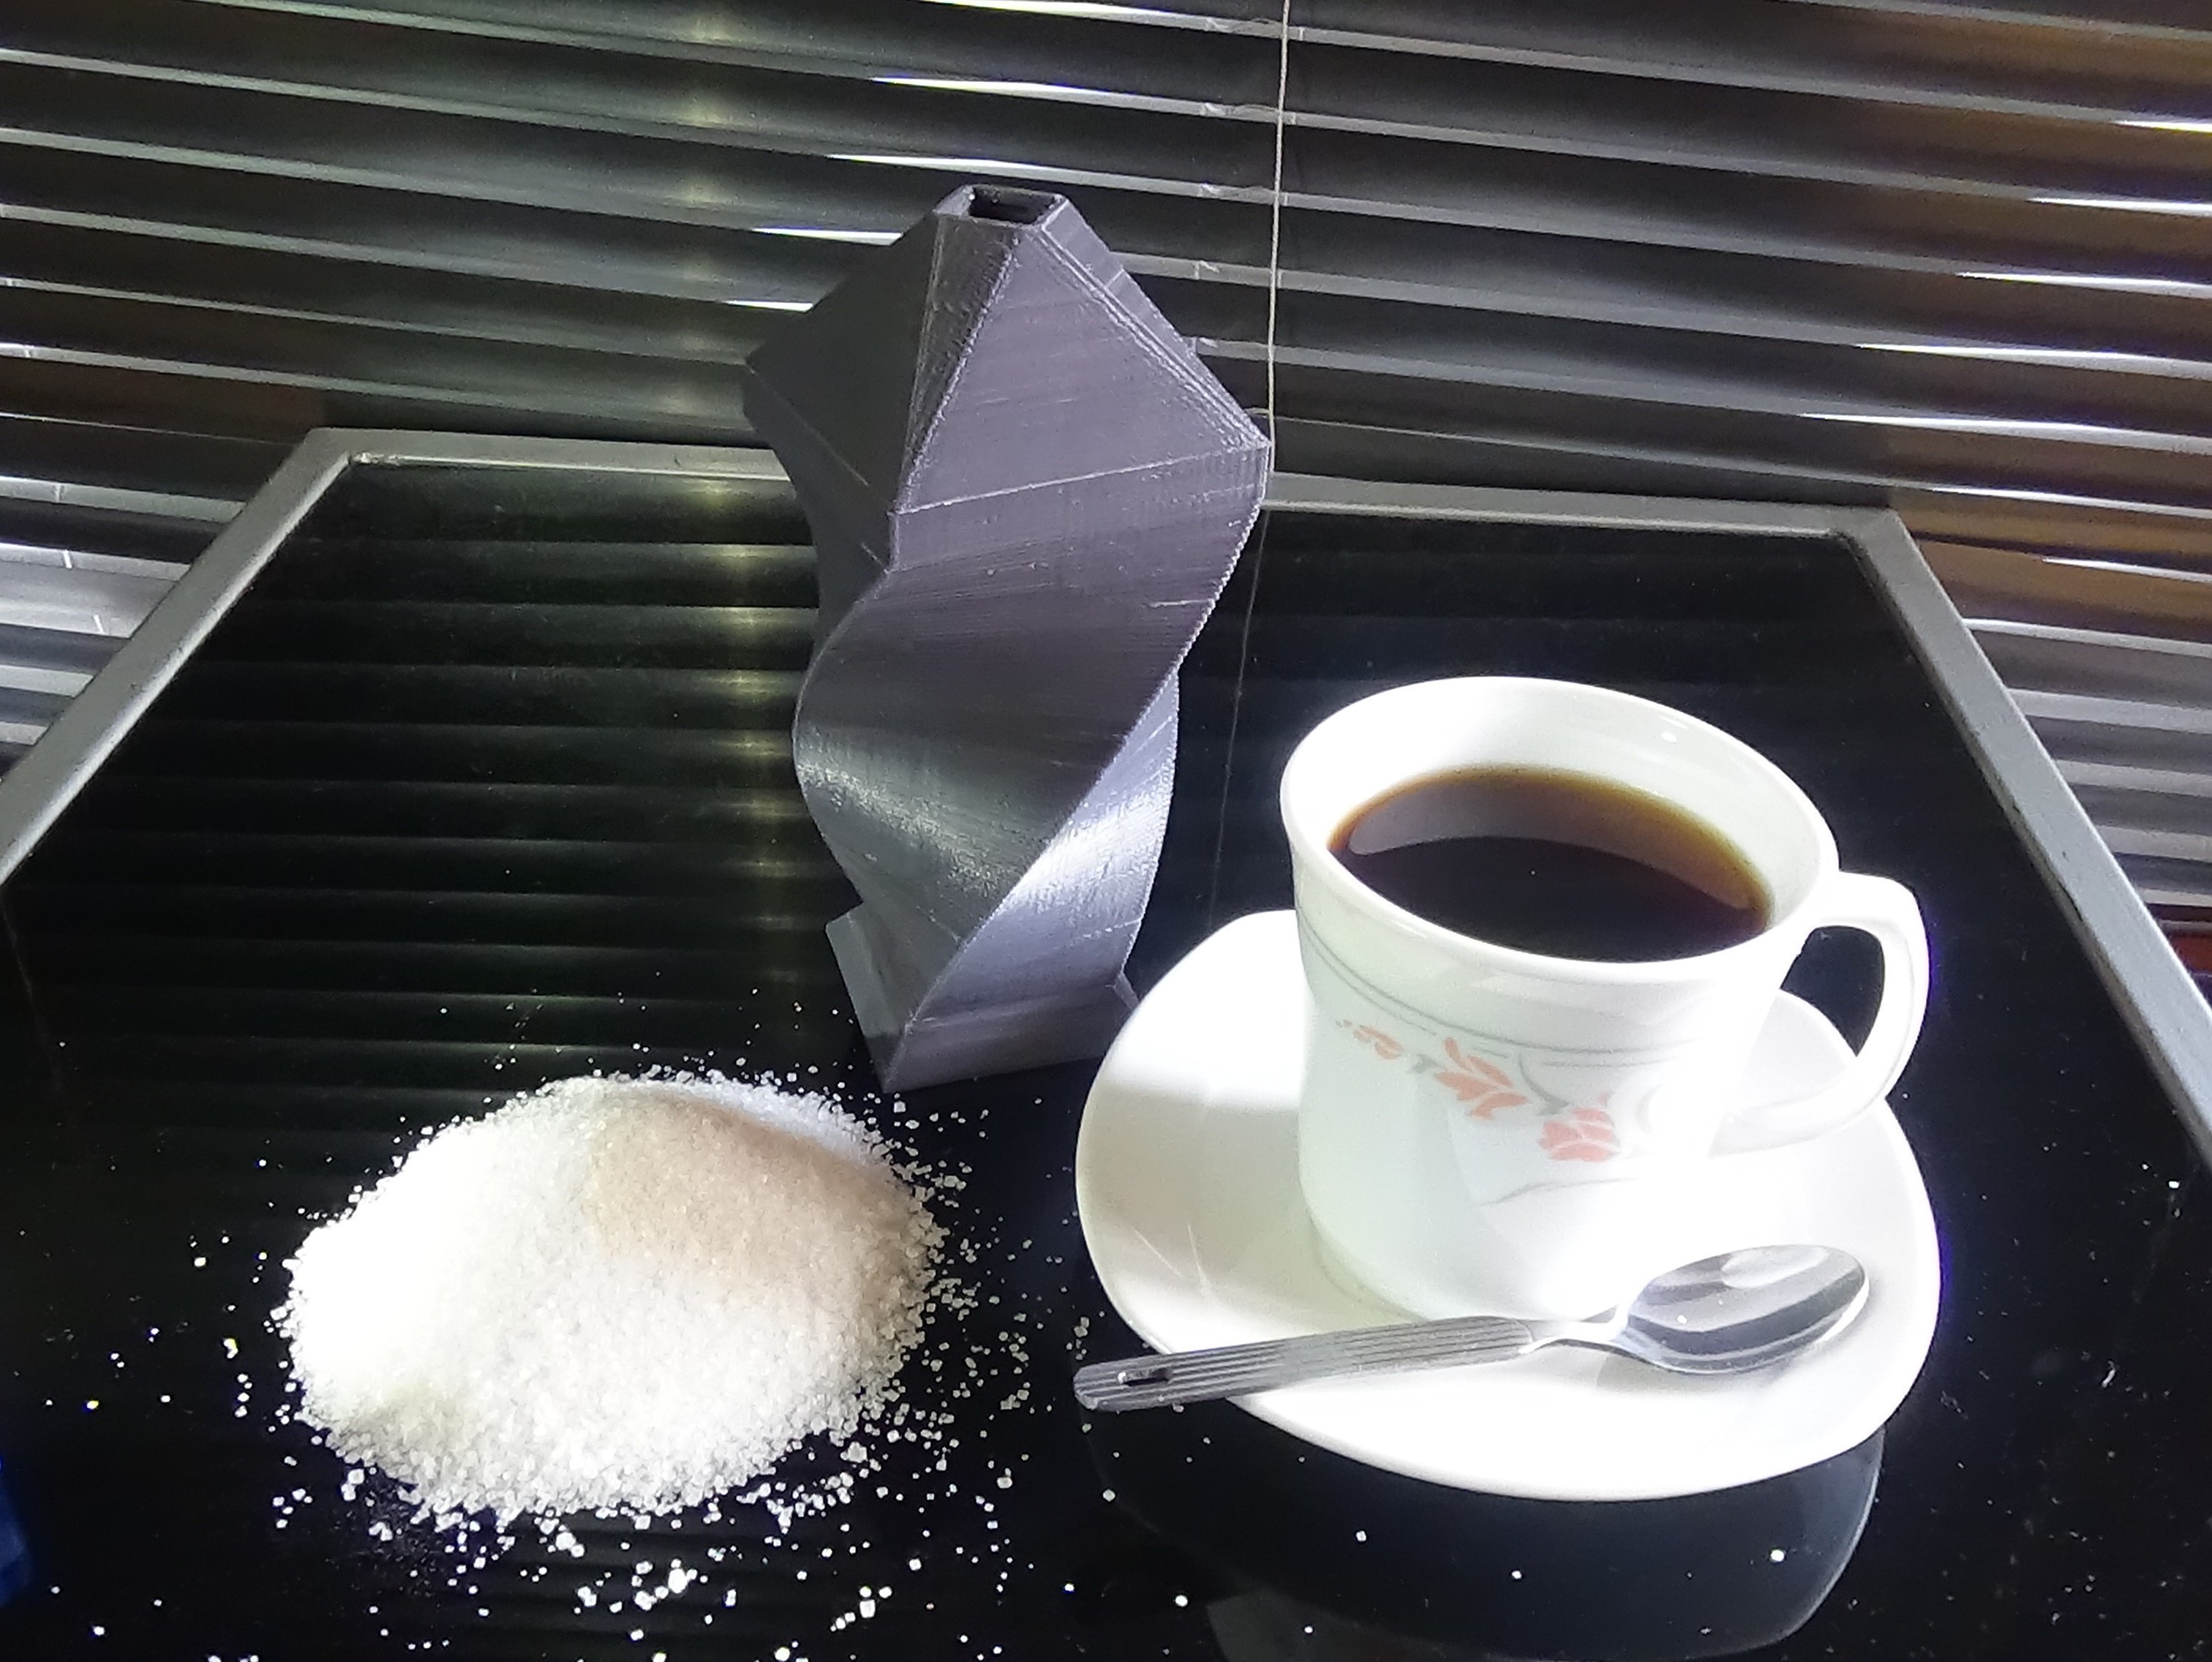 DSC01870.JPG Download STL file Sugar dispenser • Object to 3D print, 3Diego